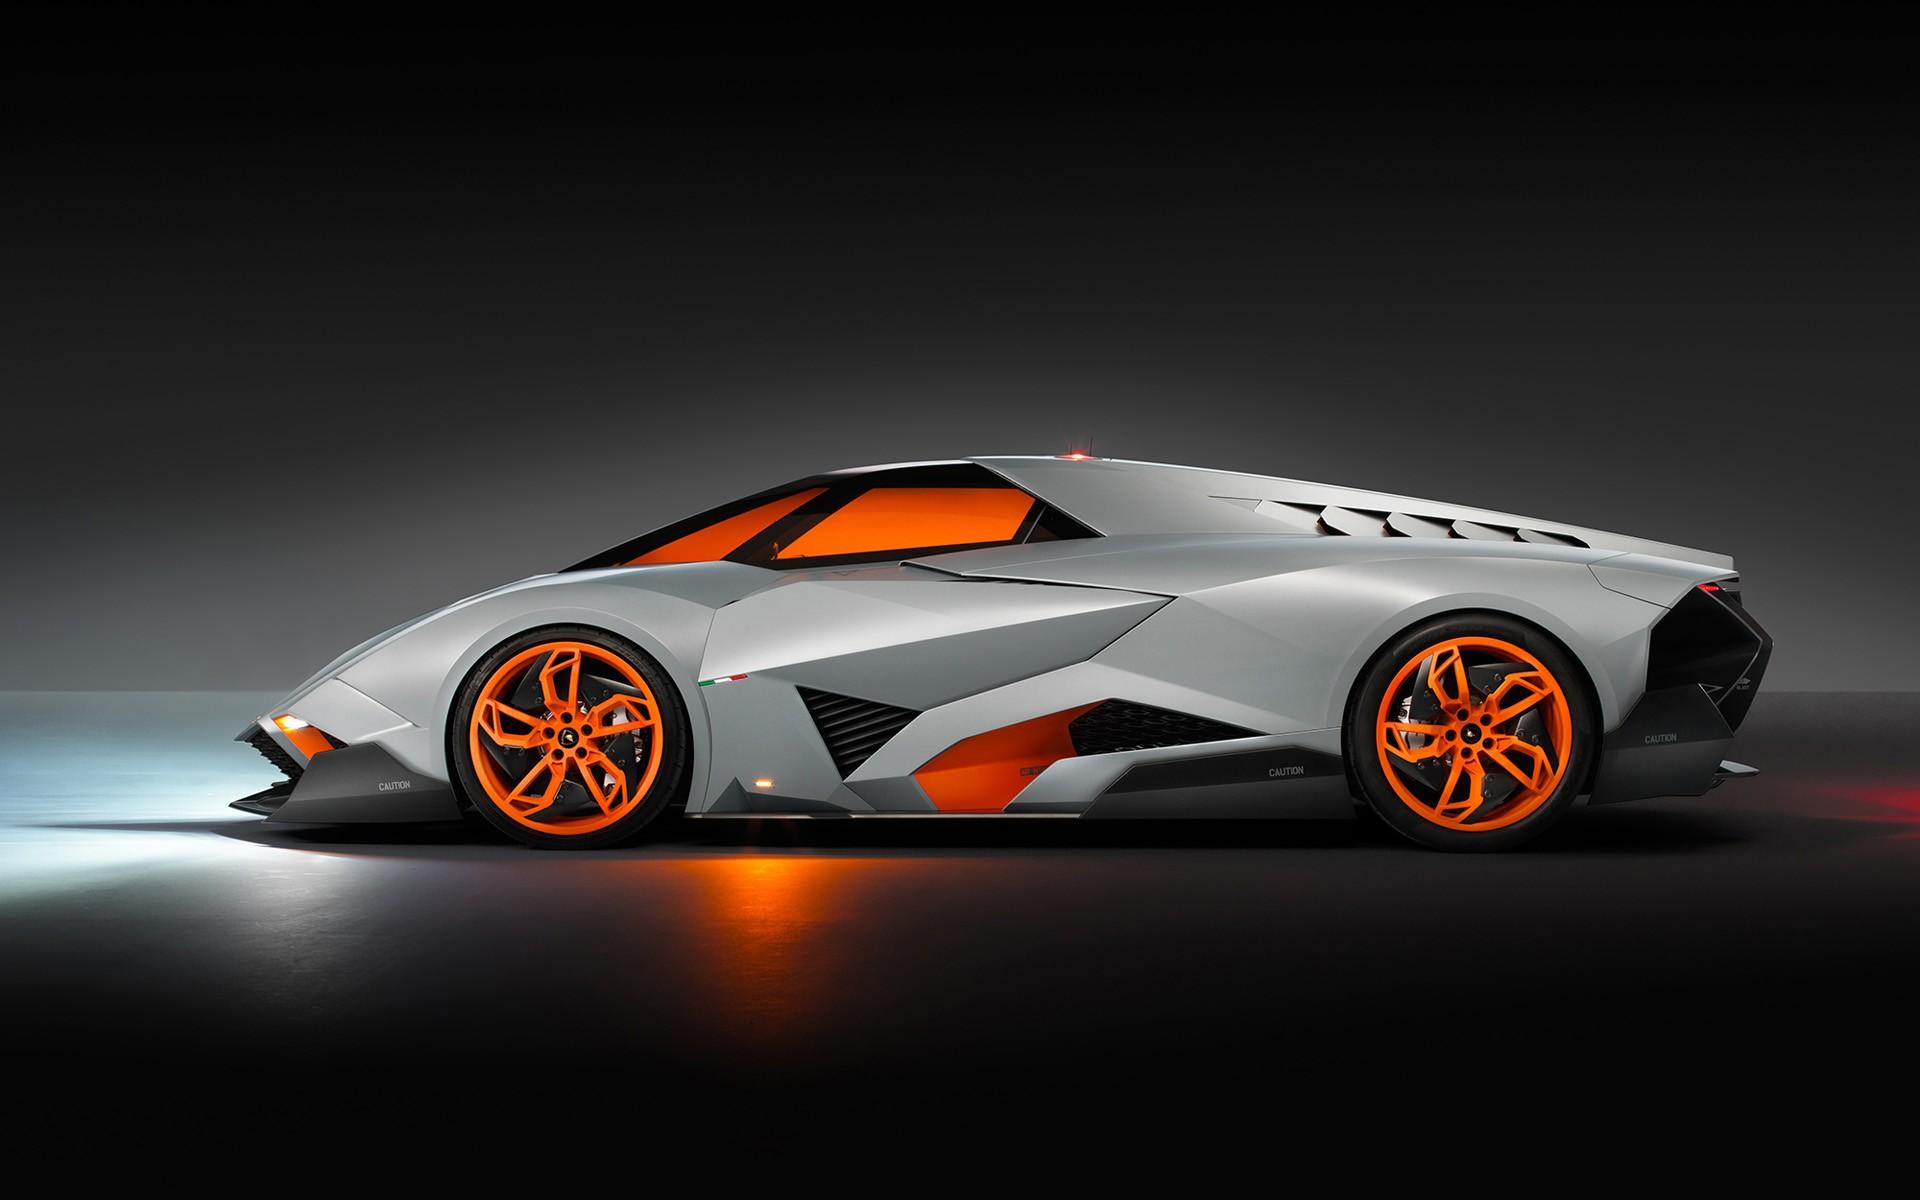 Wallpaper Concept Cars Lamborghini Sports Car Performance Car